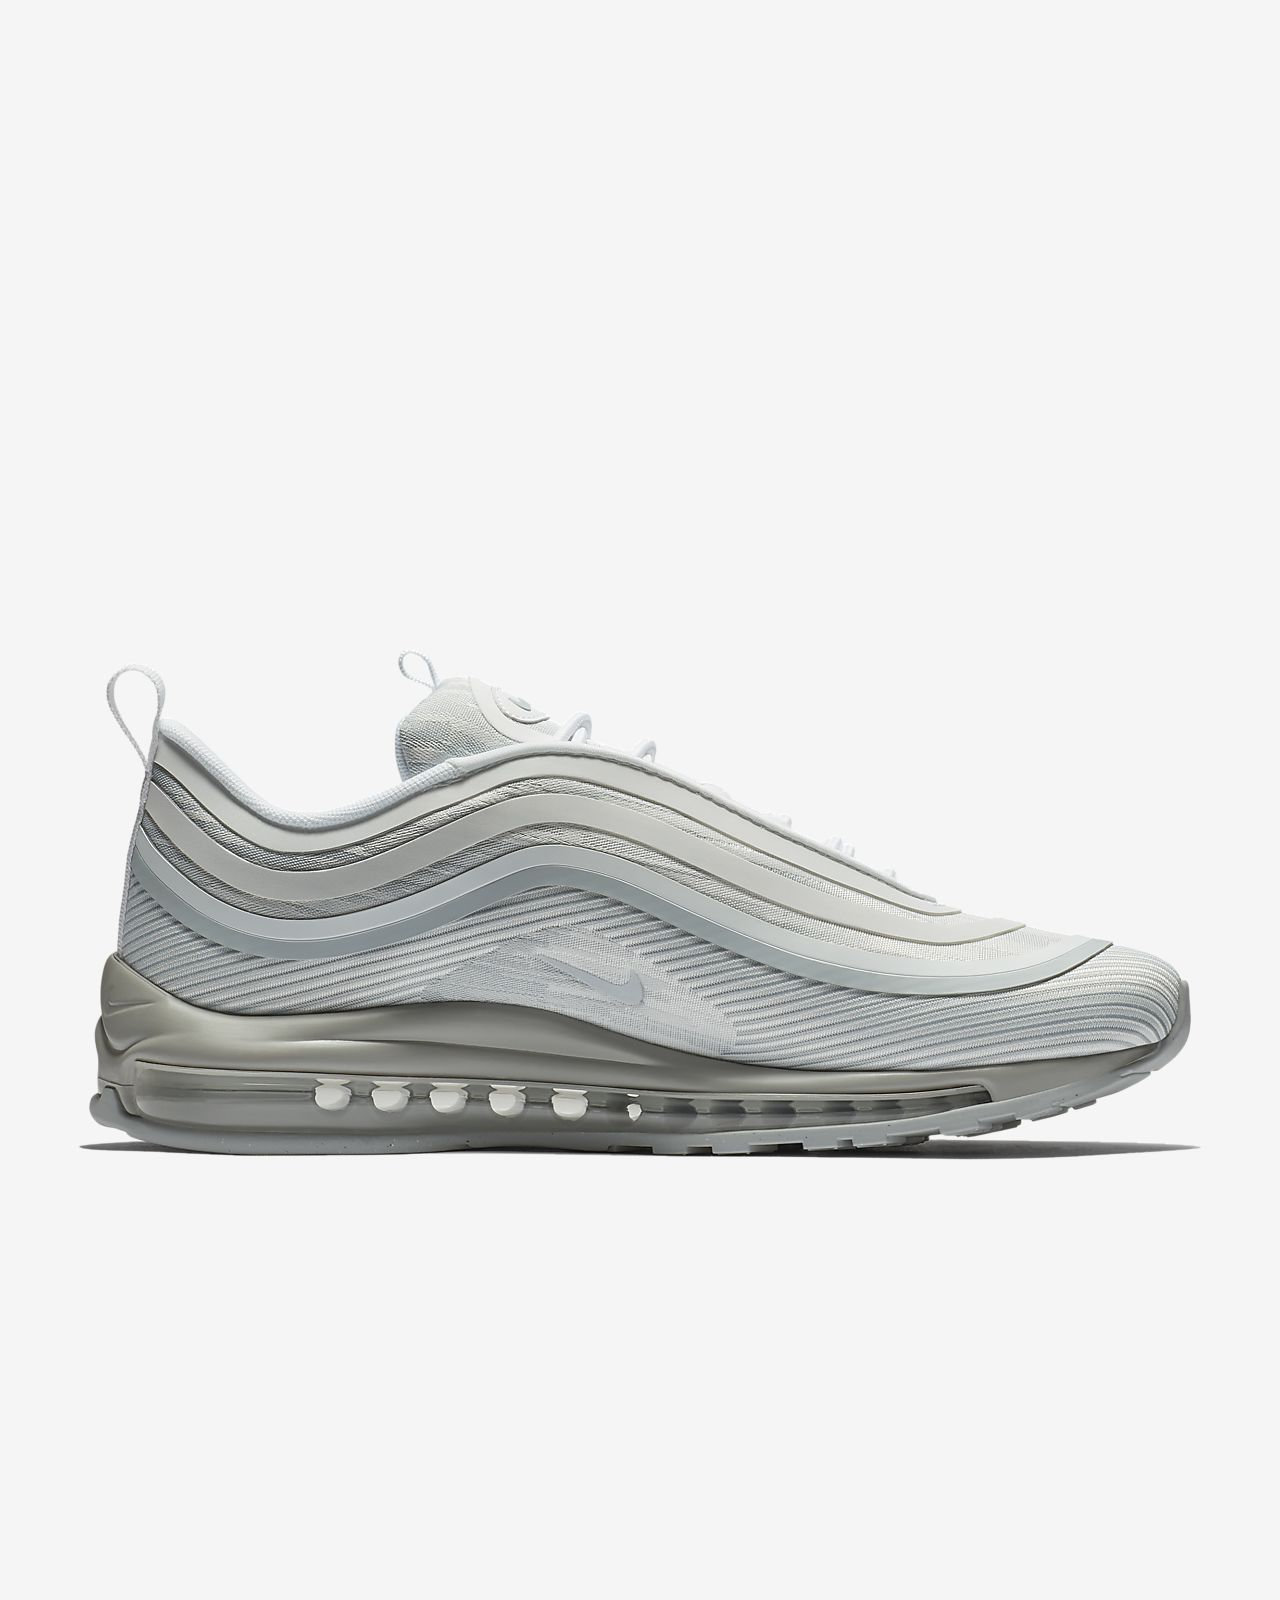 Sneaker Nike Air Max 97 Ultra SE Chaussures Nike 2018 Pas